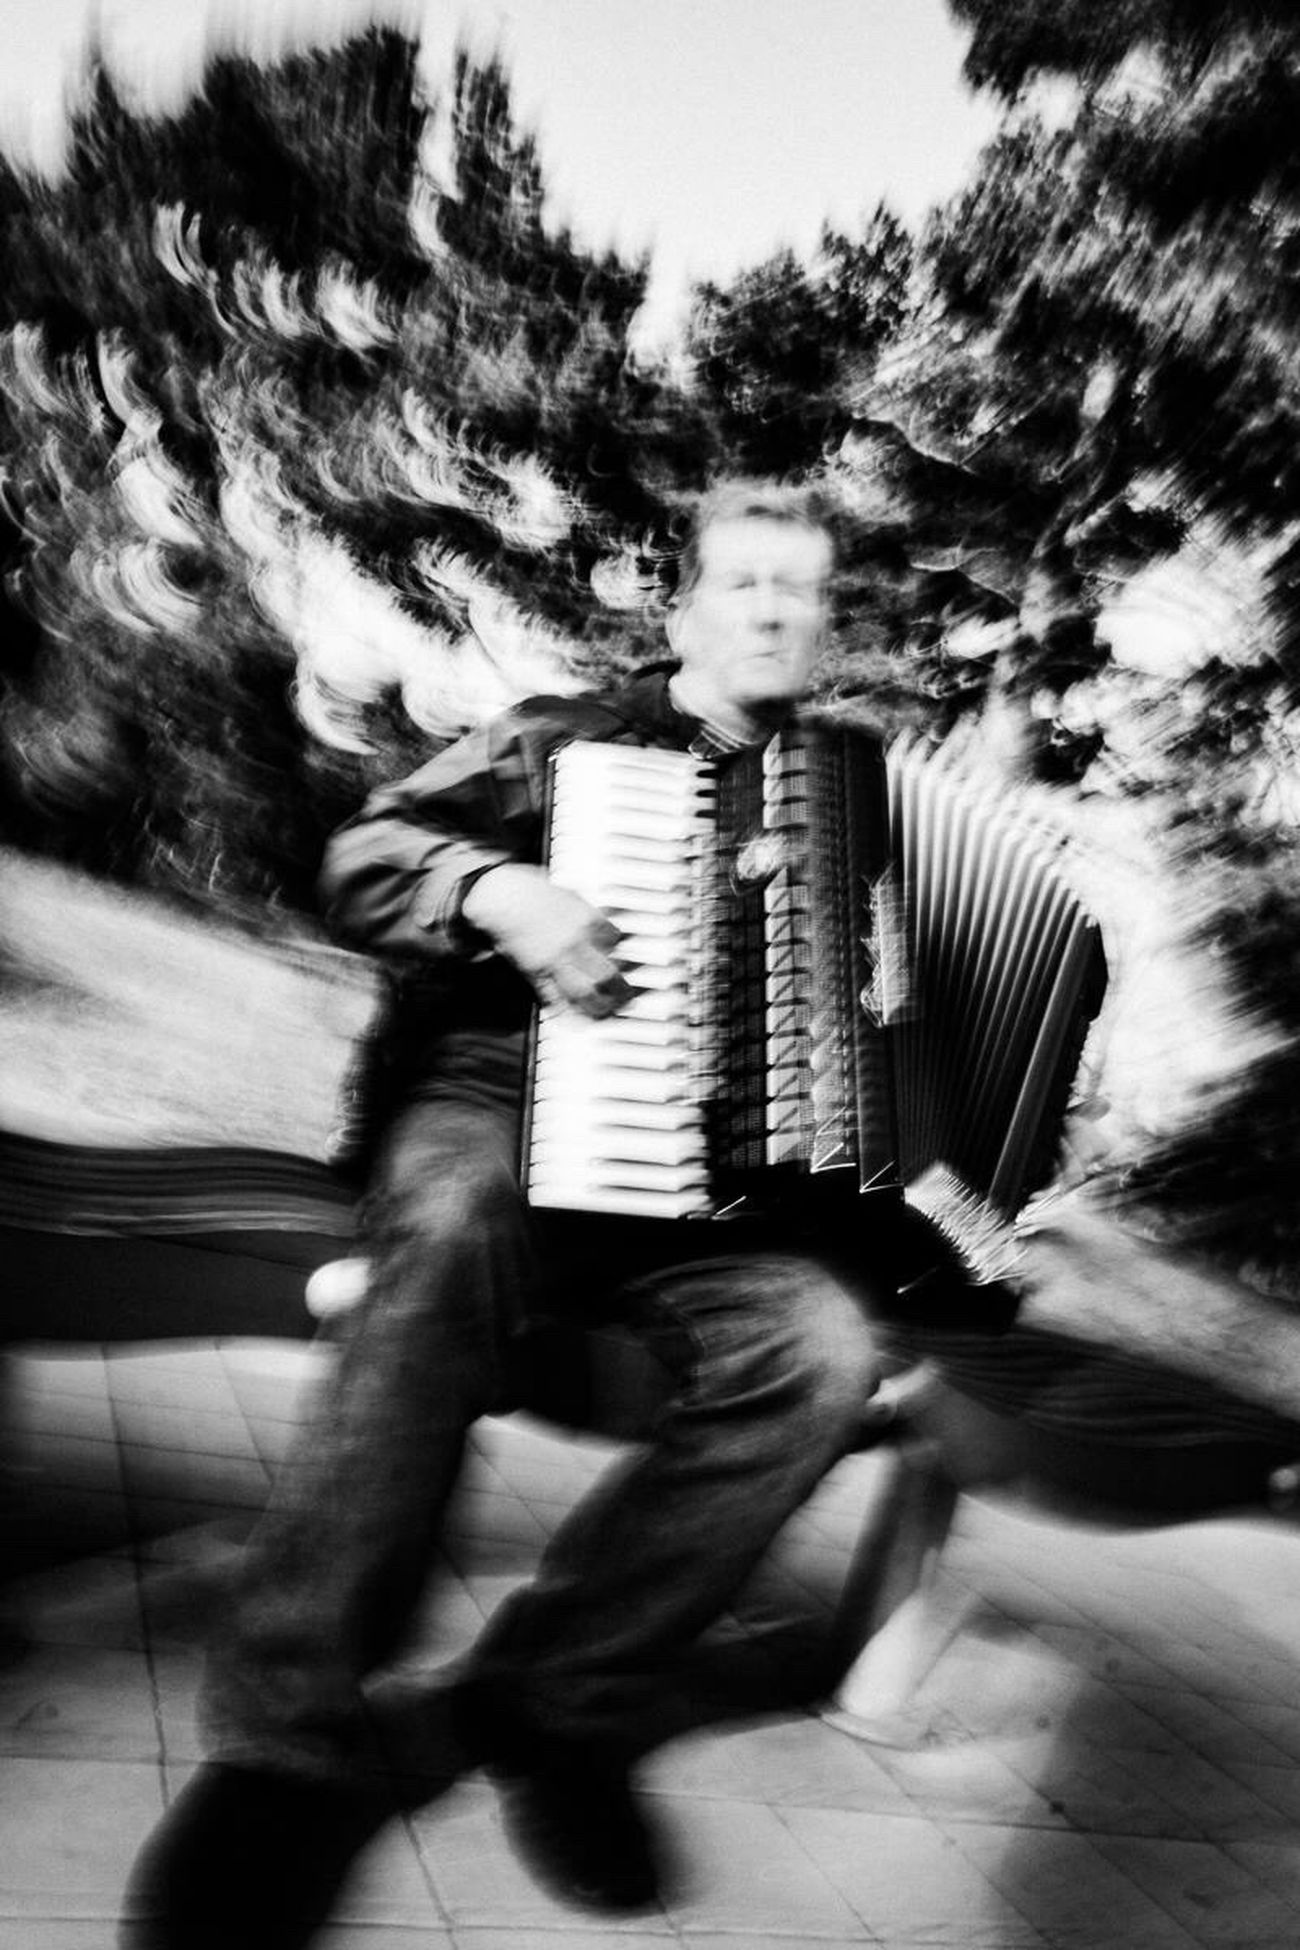 Streetphotography Blackandwhite Man Music Vibration Motion Real People Lifestyles